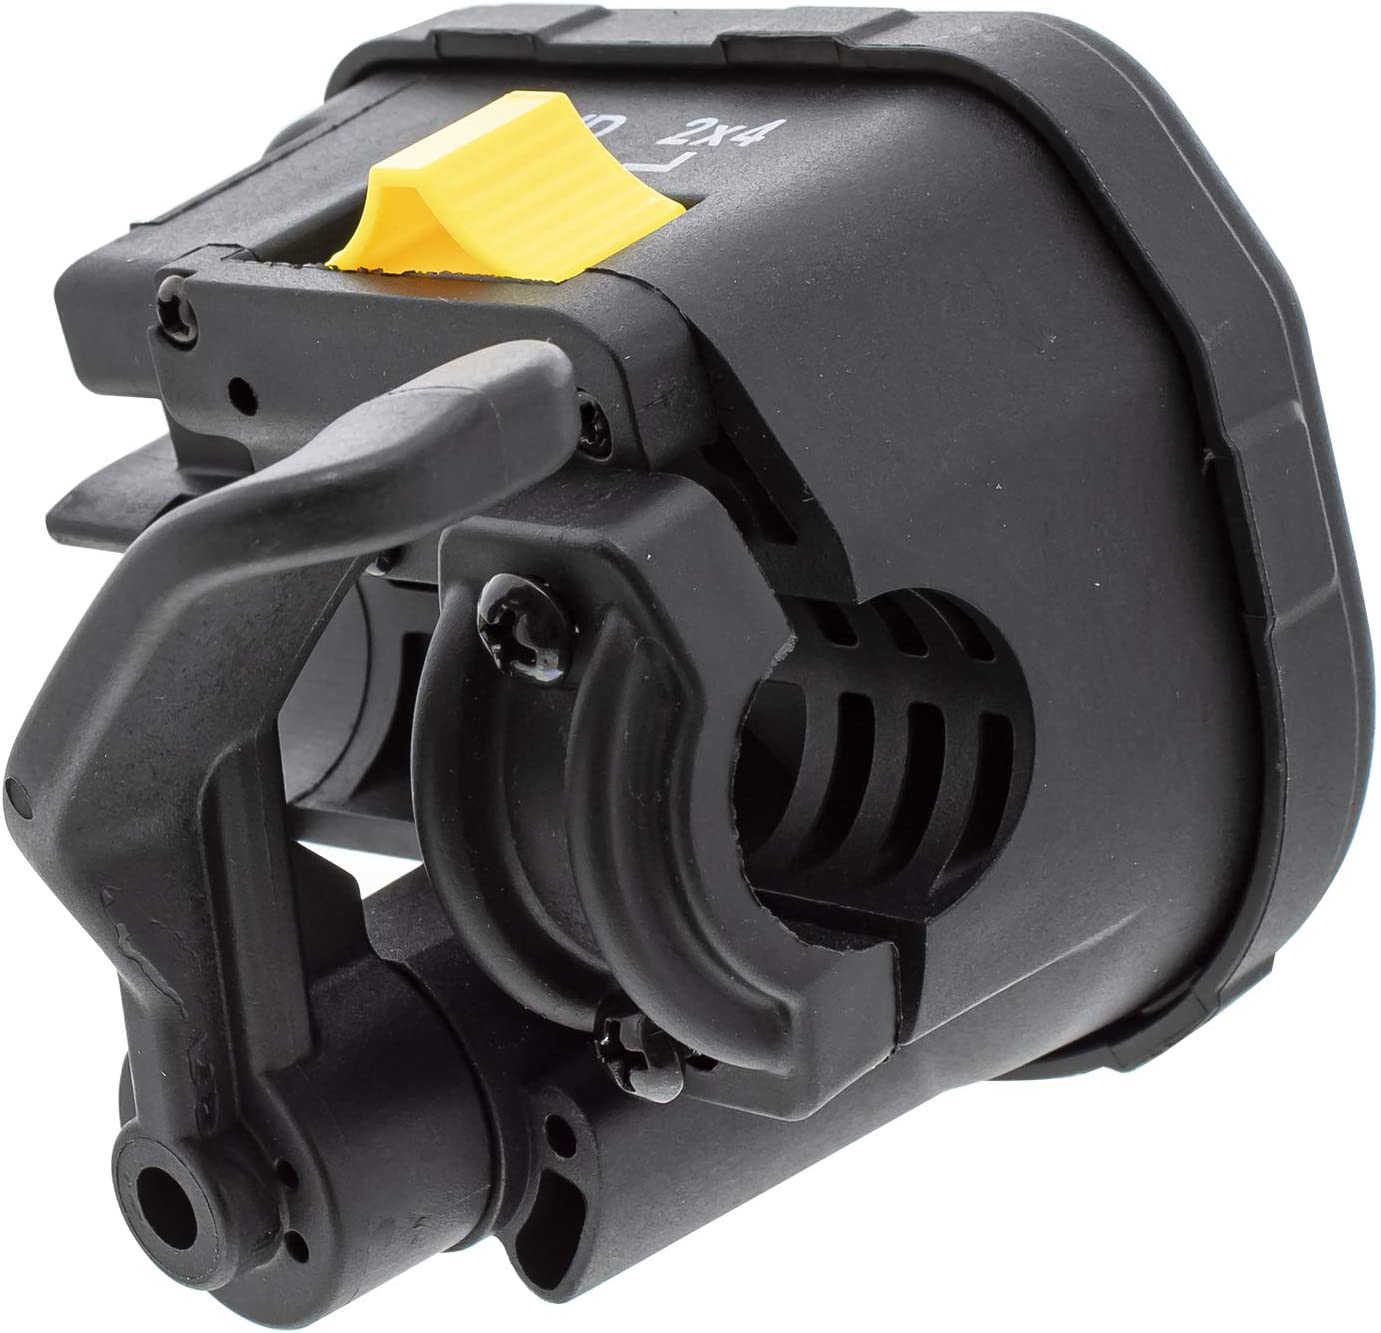 NICHE Thumb Throttle Control Lever Assembly For 1999-2014 Polaris Scrambler 400 Magnum Sportsman 500 2010202,2010337,2010336